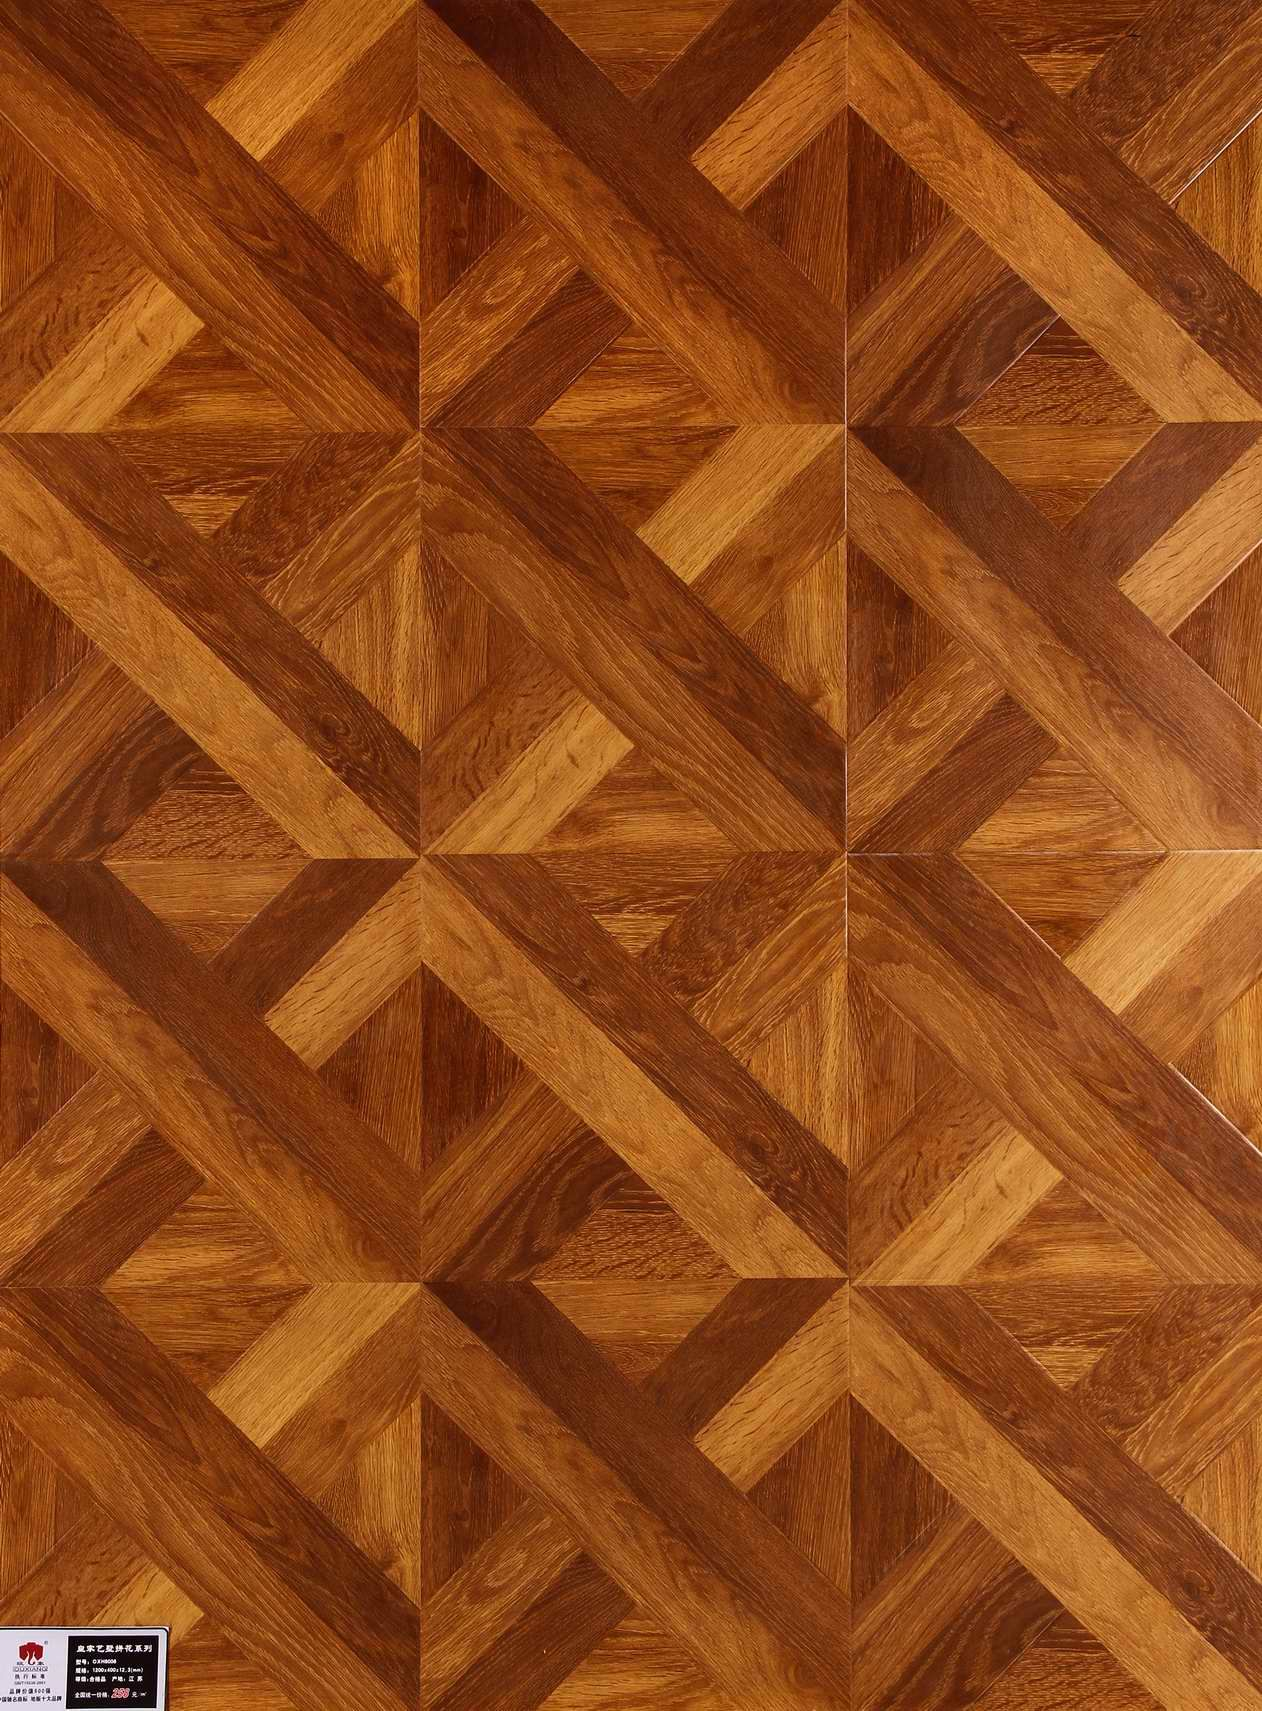 Parquet wood flooring hardwood flooring pinterest china wood flooring parquet wood flooring doublecrazyfo Images